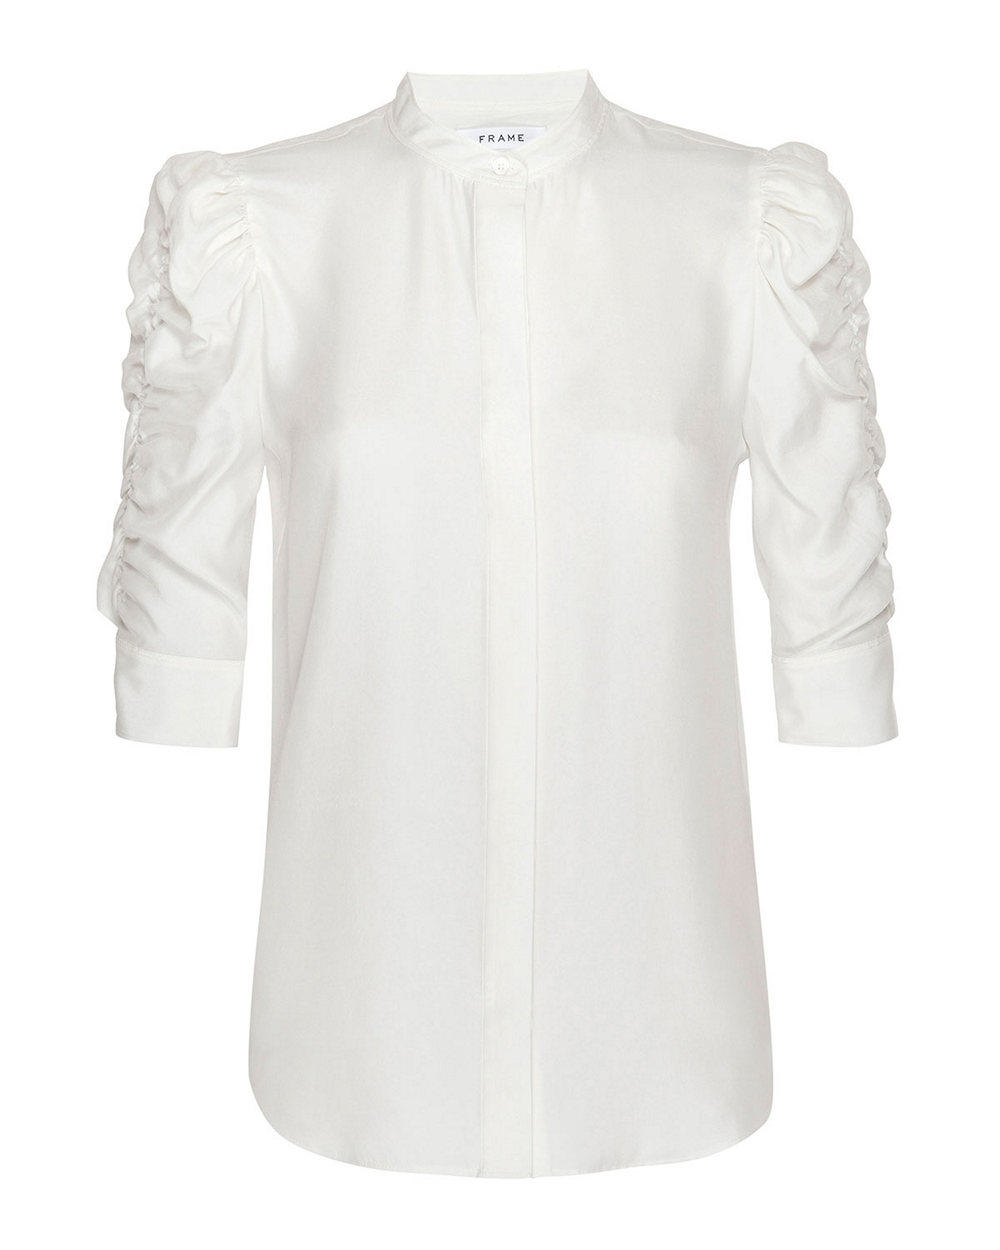 Gillian Poplin Puff Sleeve Top Item # LWSH2121